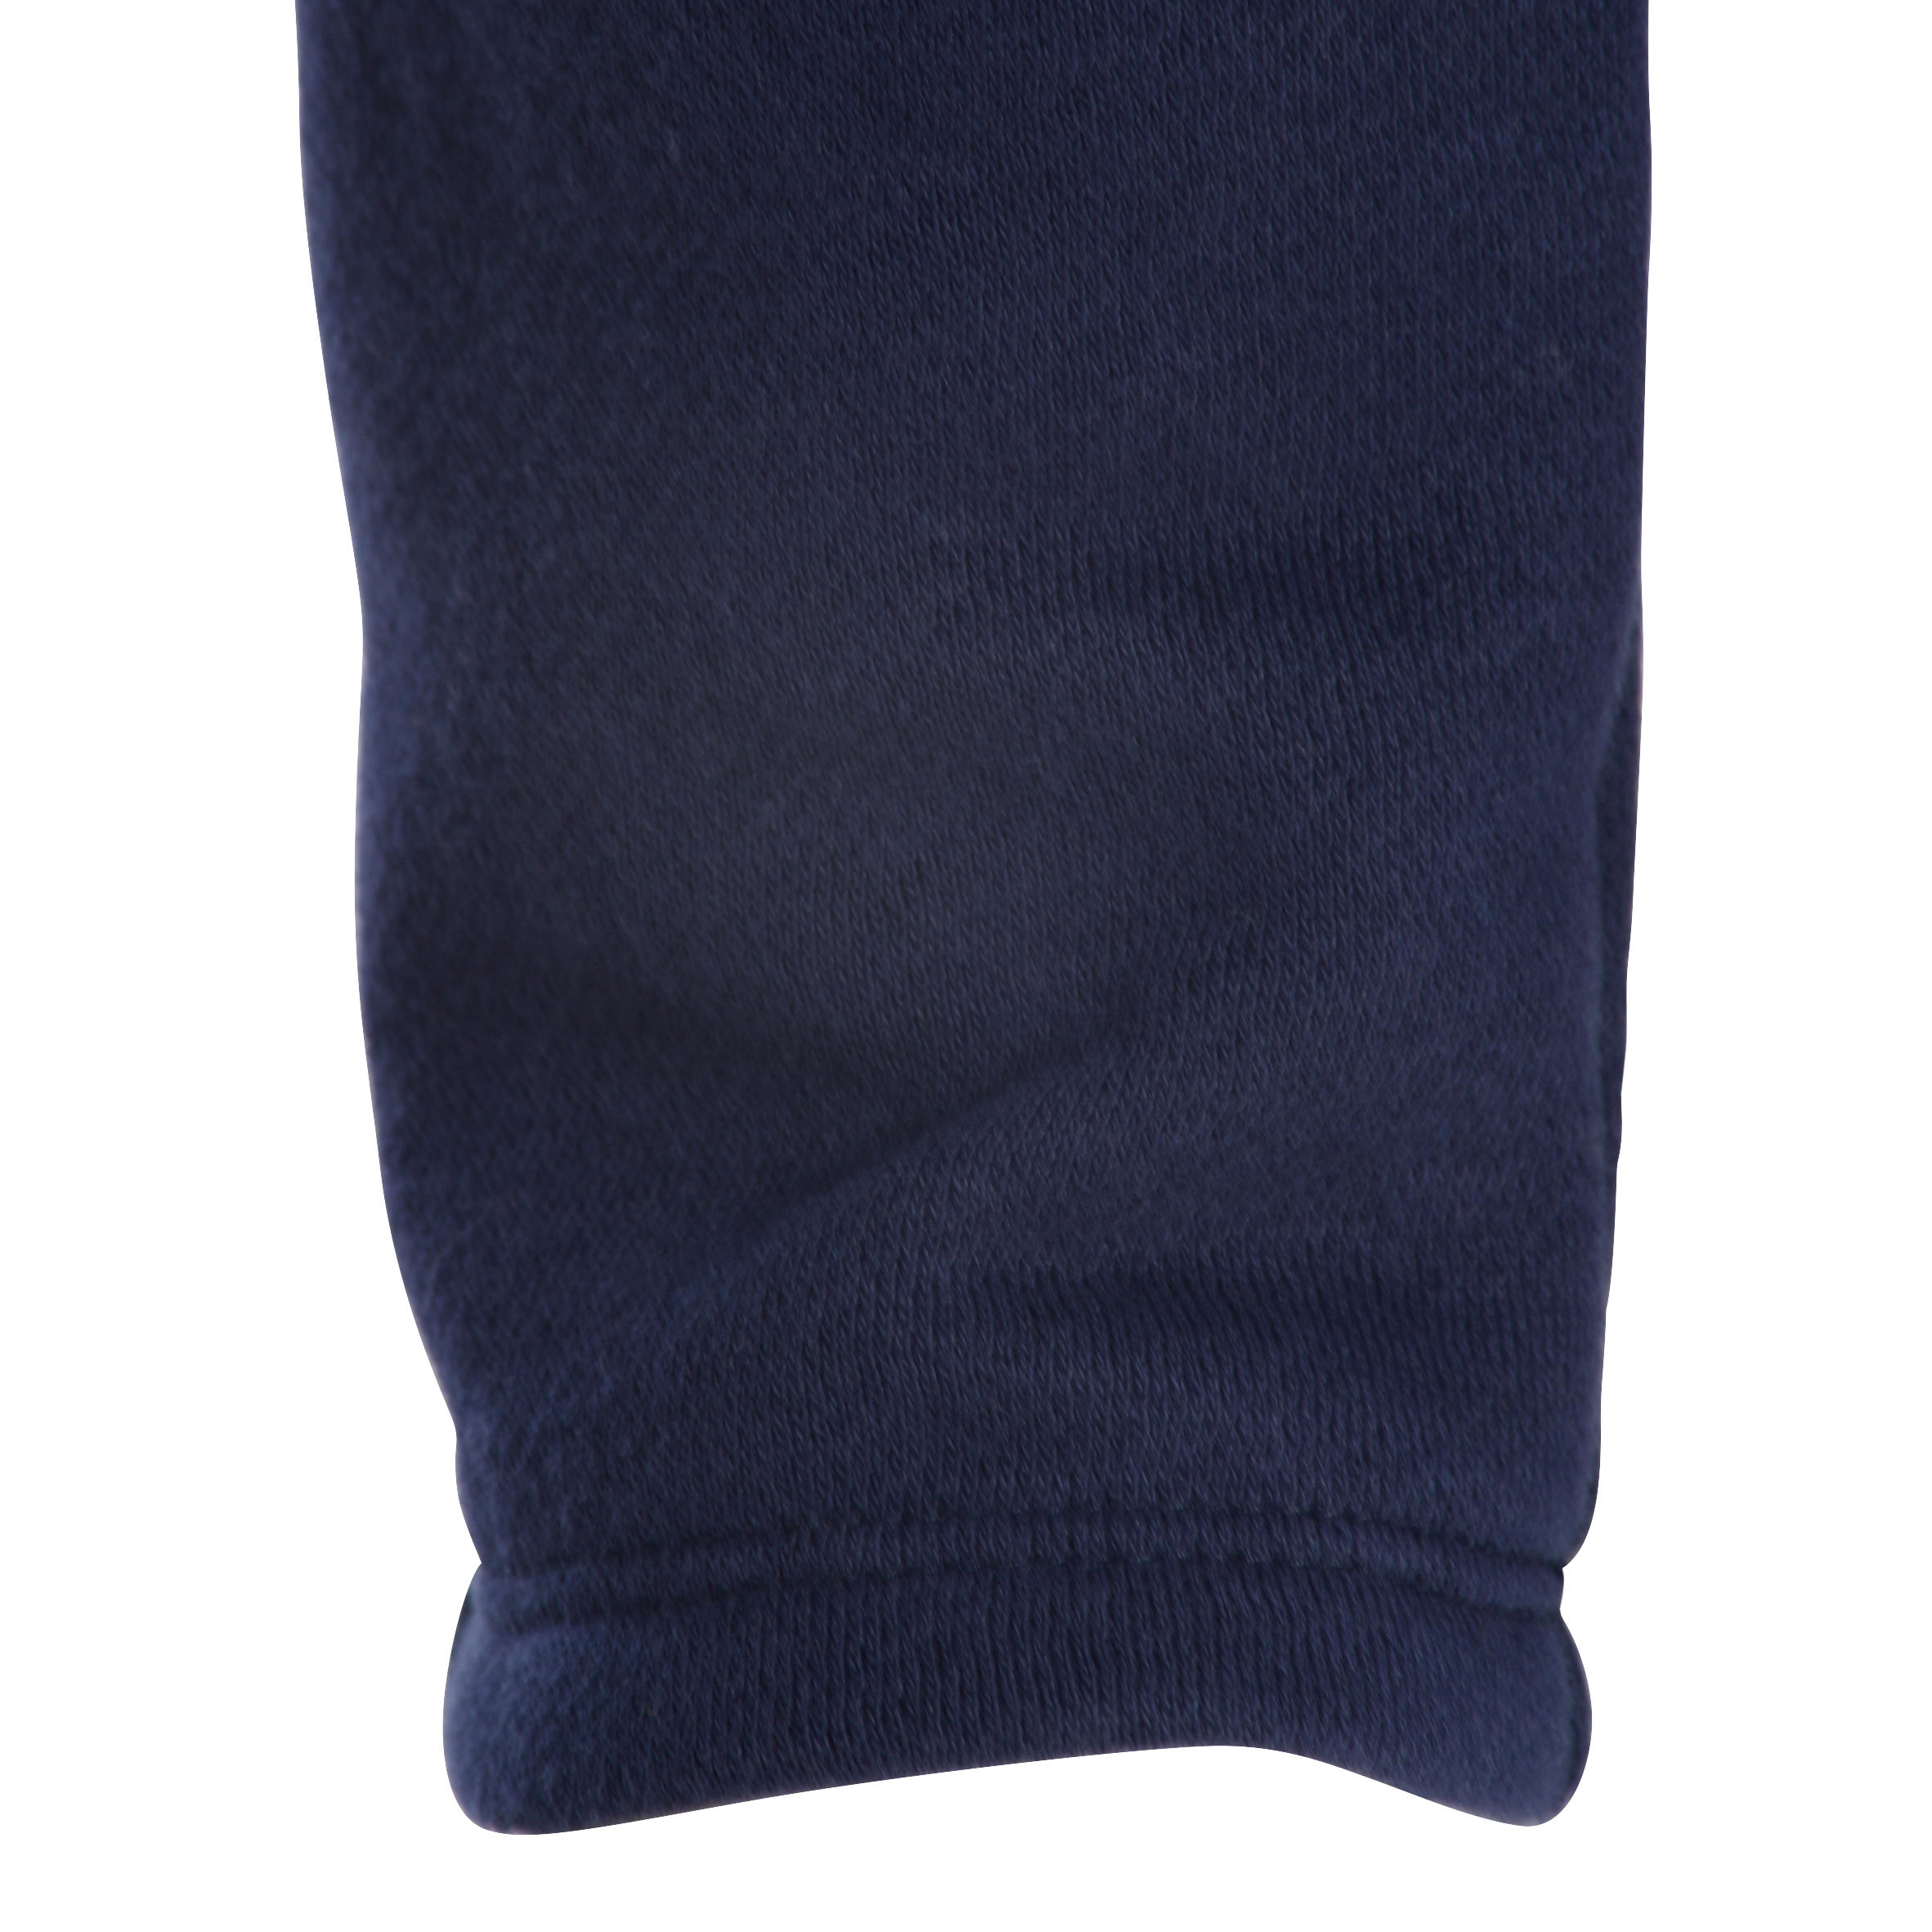 Pantalon chaud gym tout-petits bleu marine O'chaud